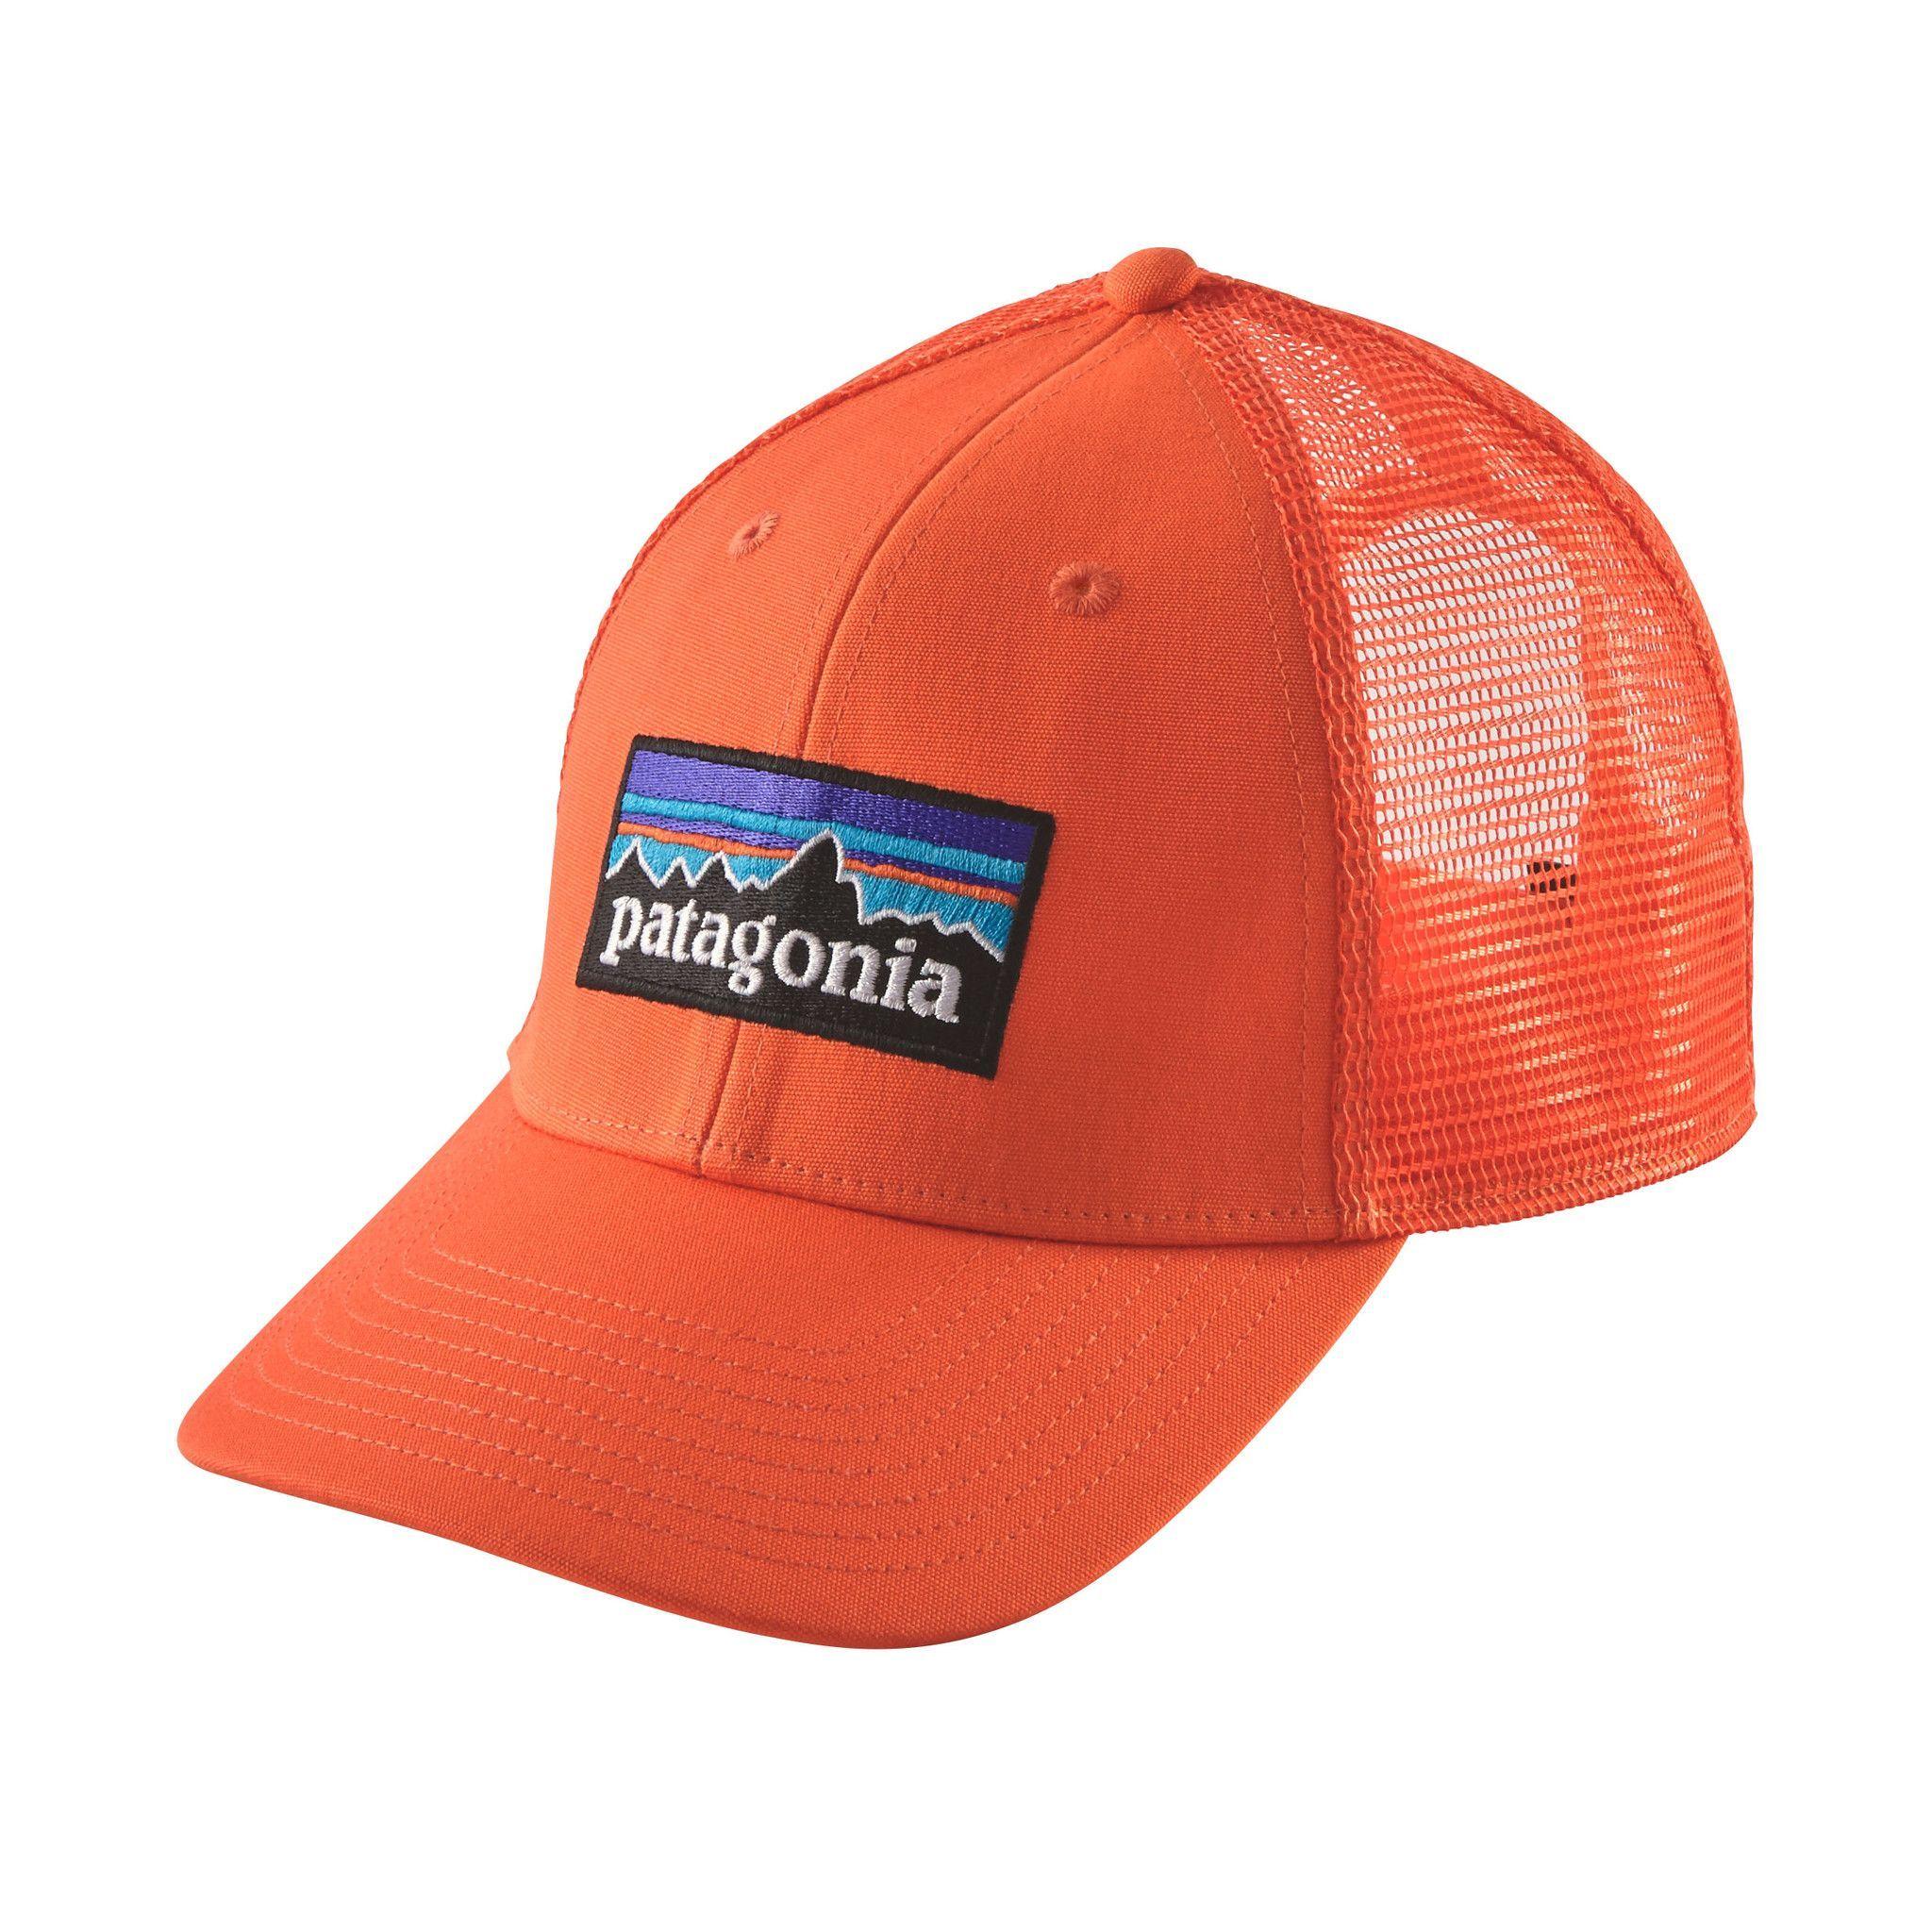 3681d4f5bacd1e Patagonia p-6 logo lopro trucker hat | Hats & Visors | Patagonia hat ...